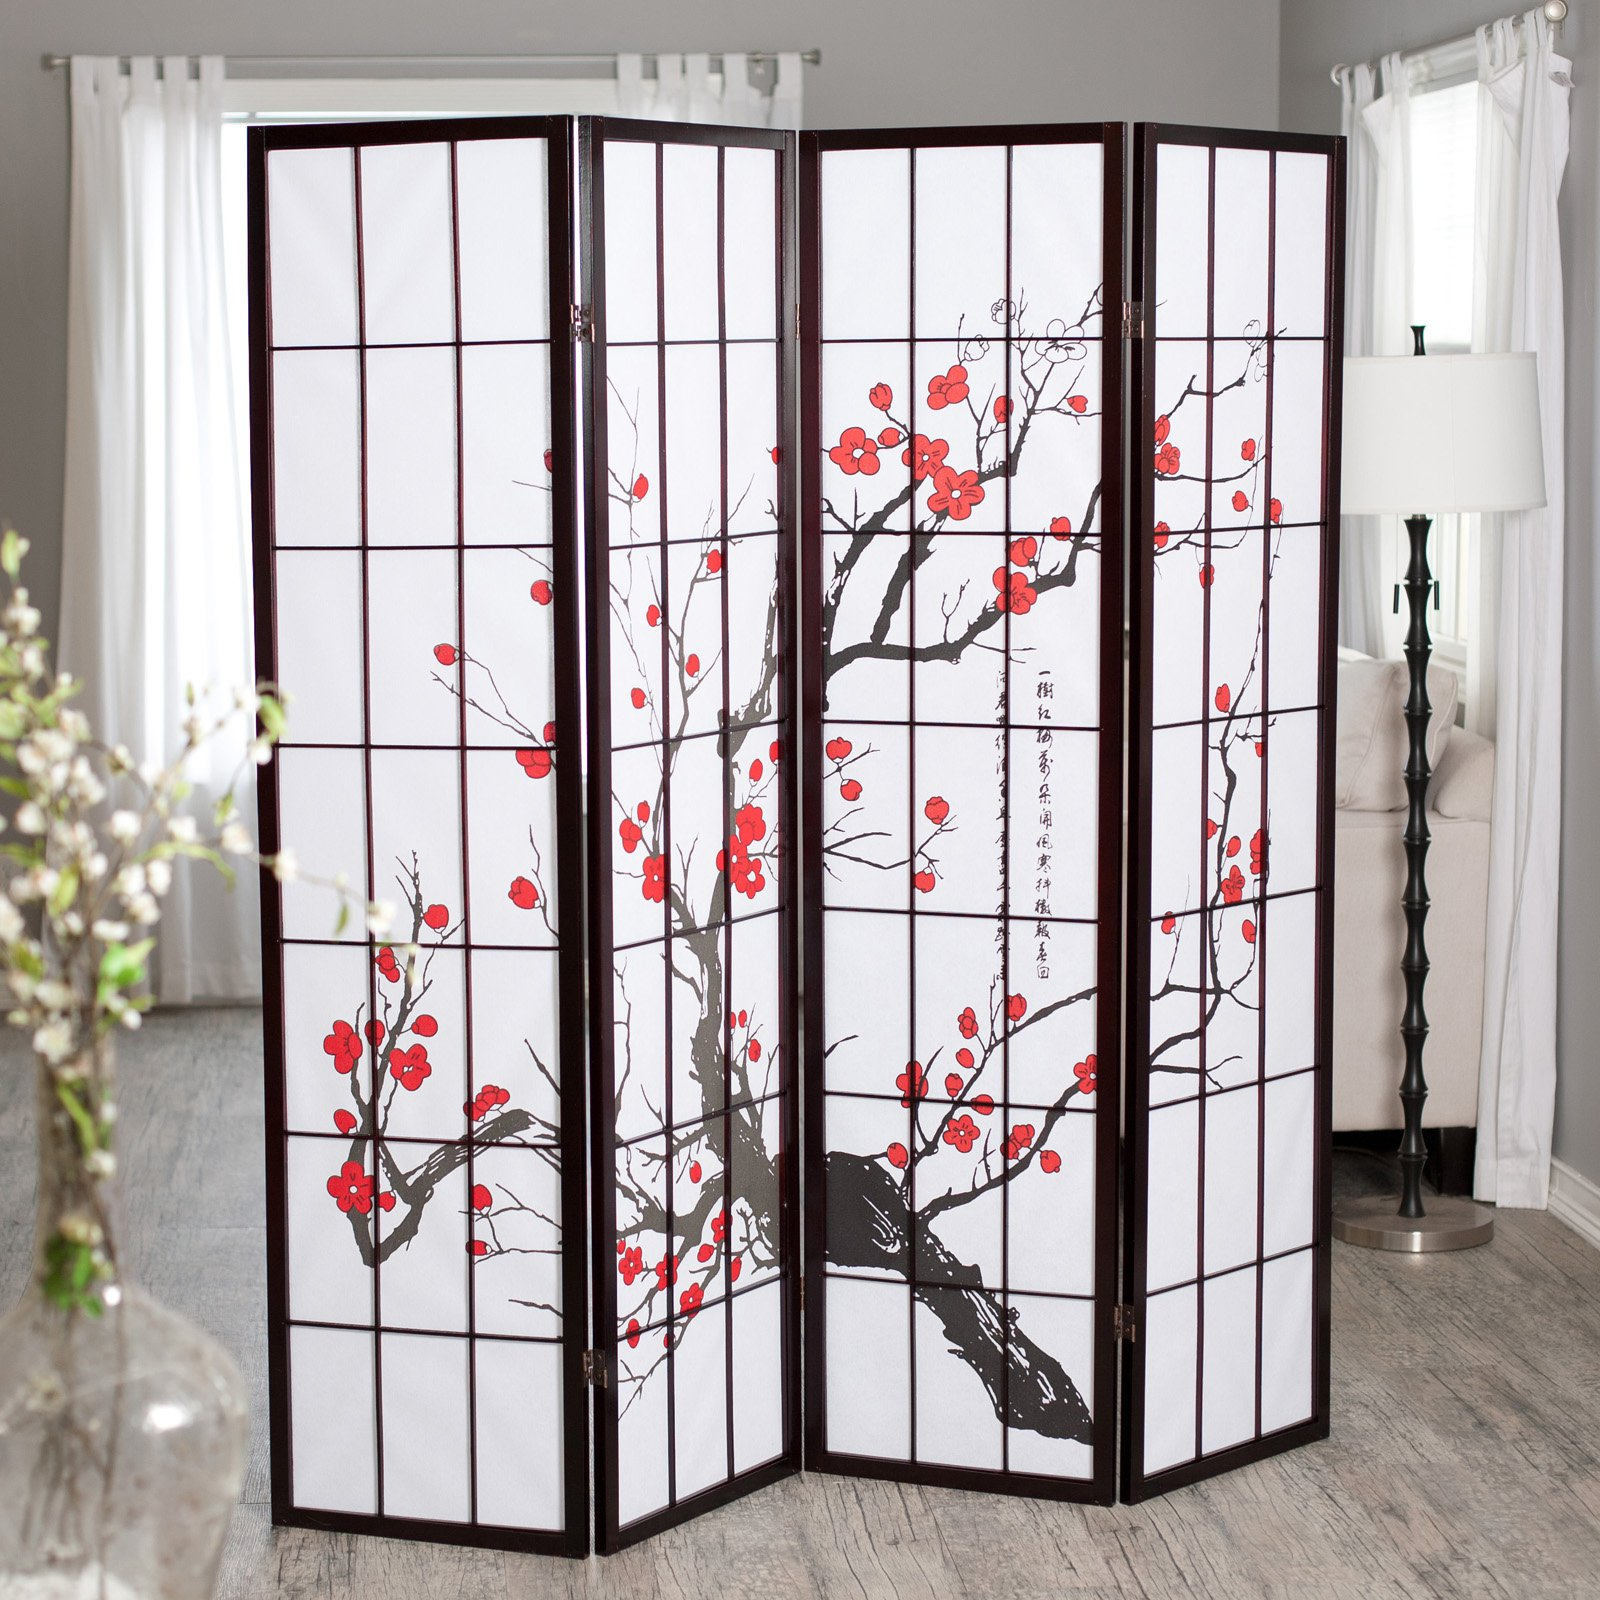 hanging room divider panels photo - 6